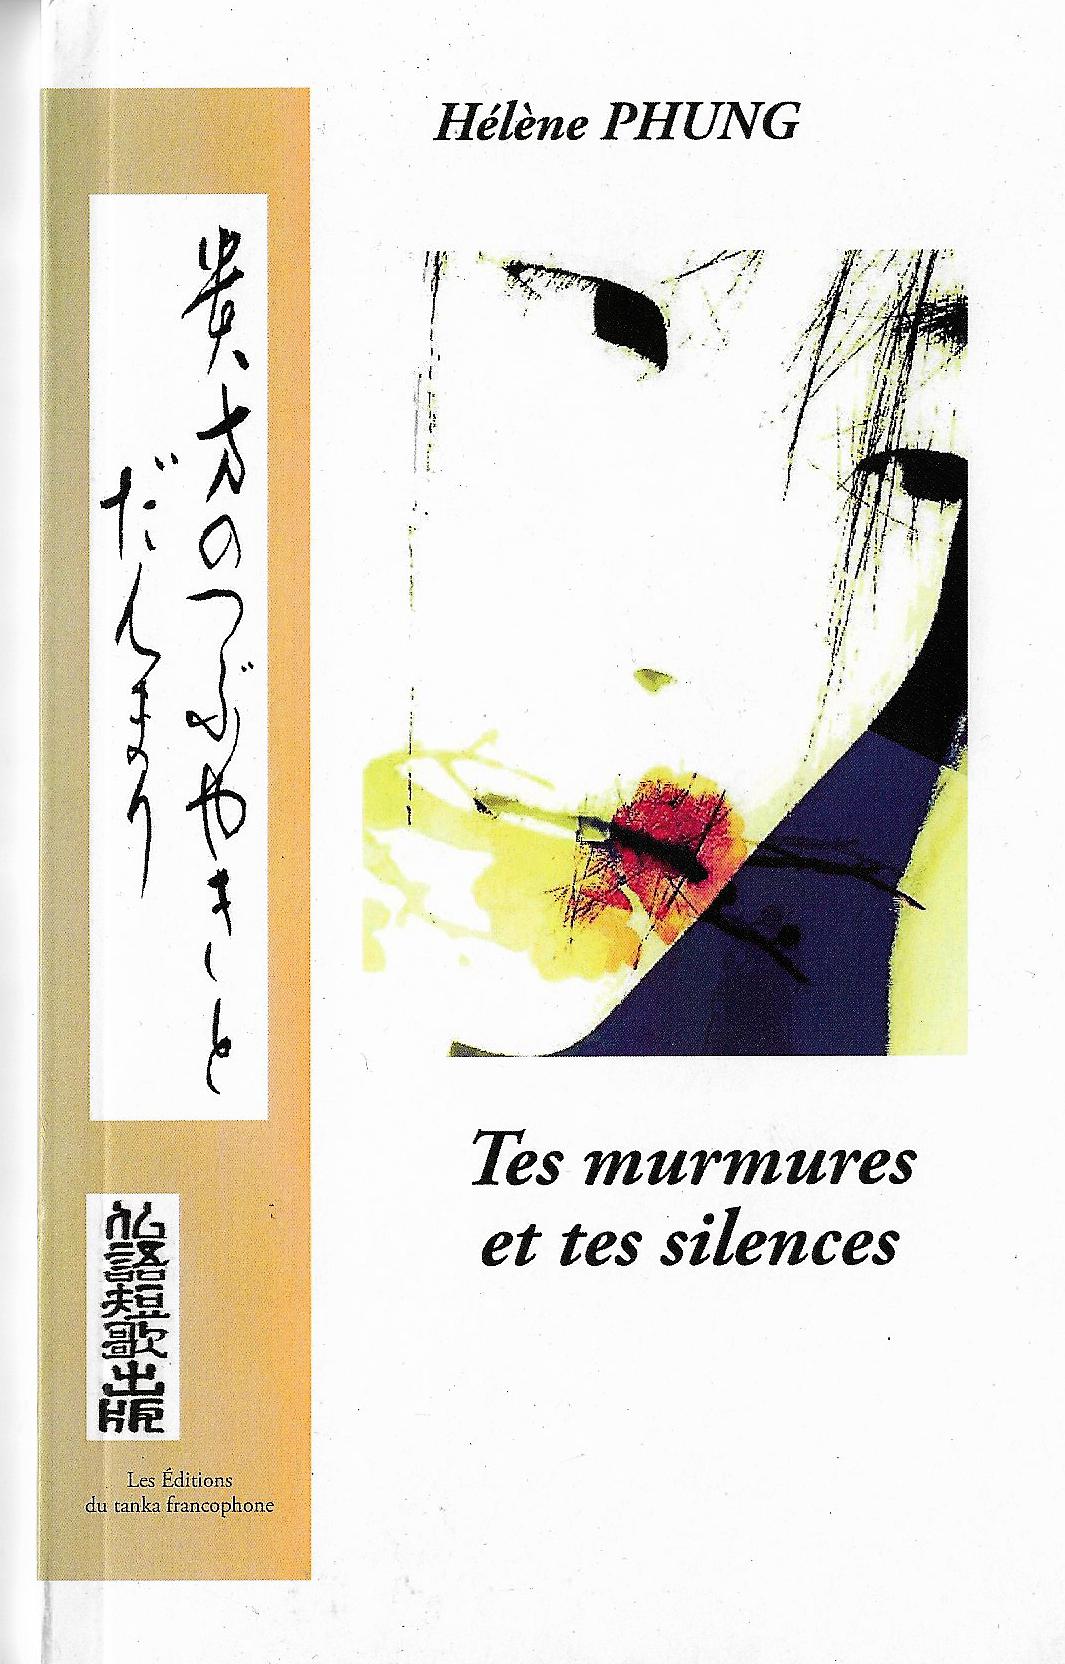 Recueil de tankas Hélène PHUNG Editions du Tanka Francophone